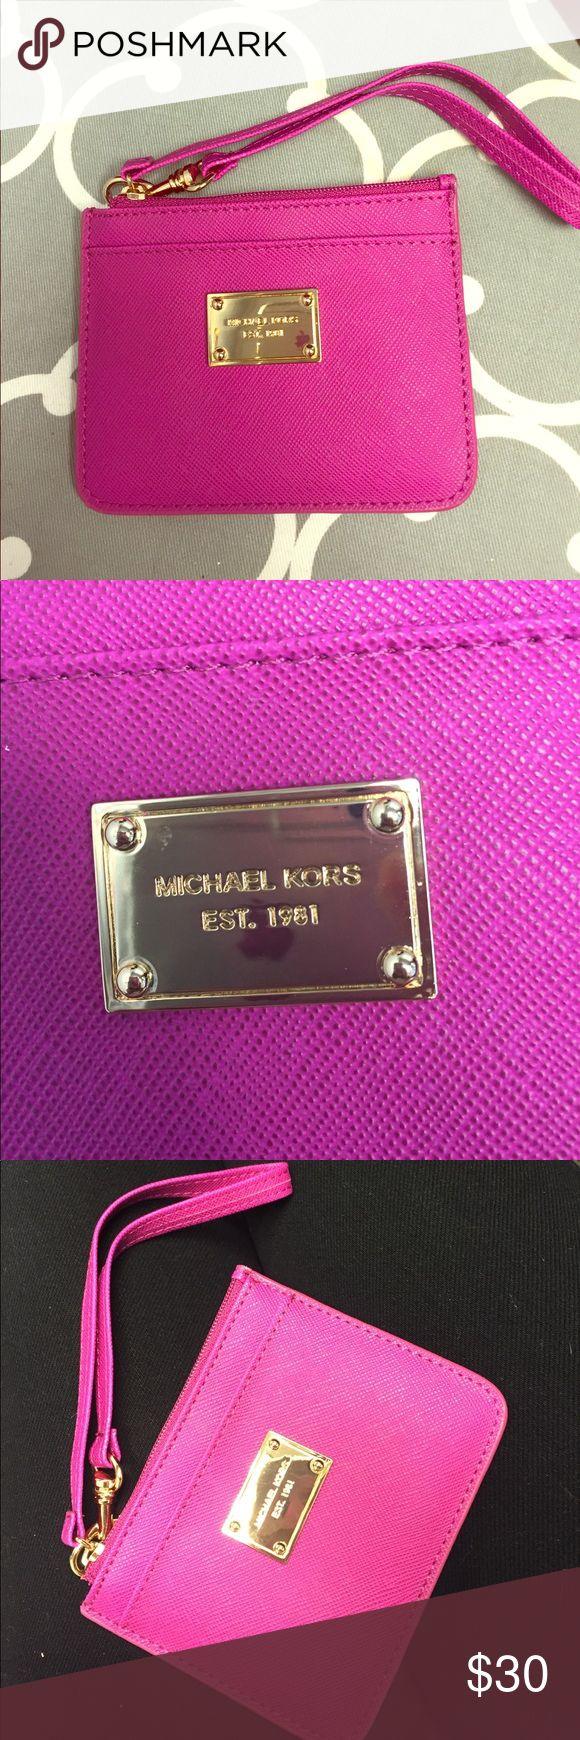 MK Pink Wristlet NEW! Michael Kors pink wristlet! Gold hardware. Michael Kors Bags Clutches & Wristlets